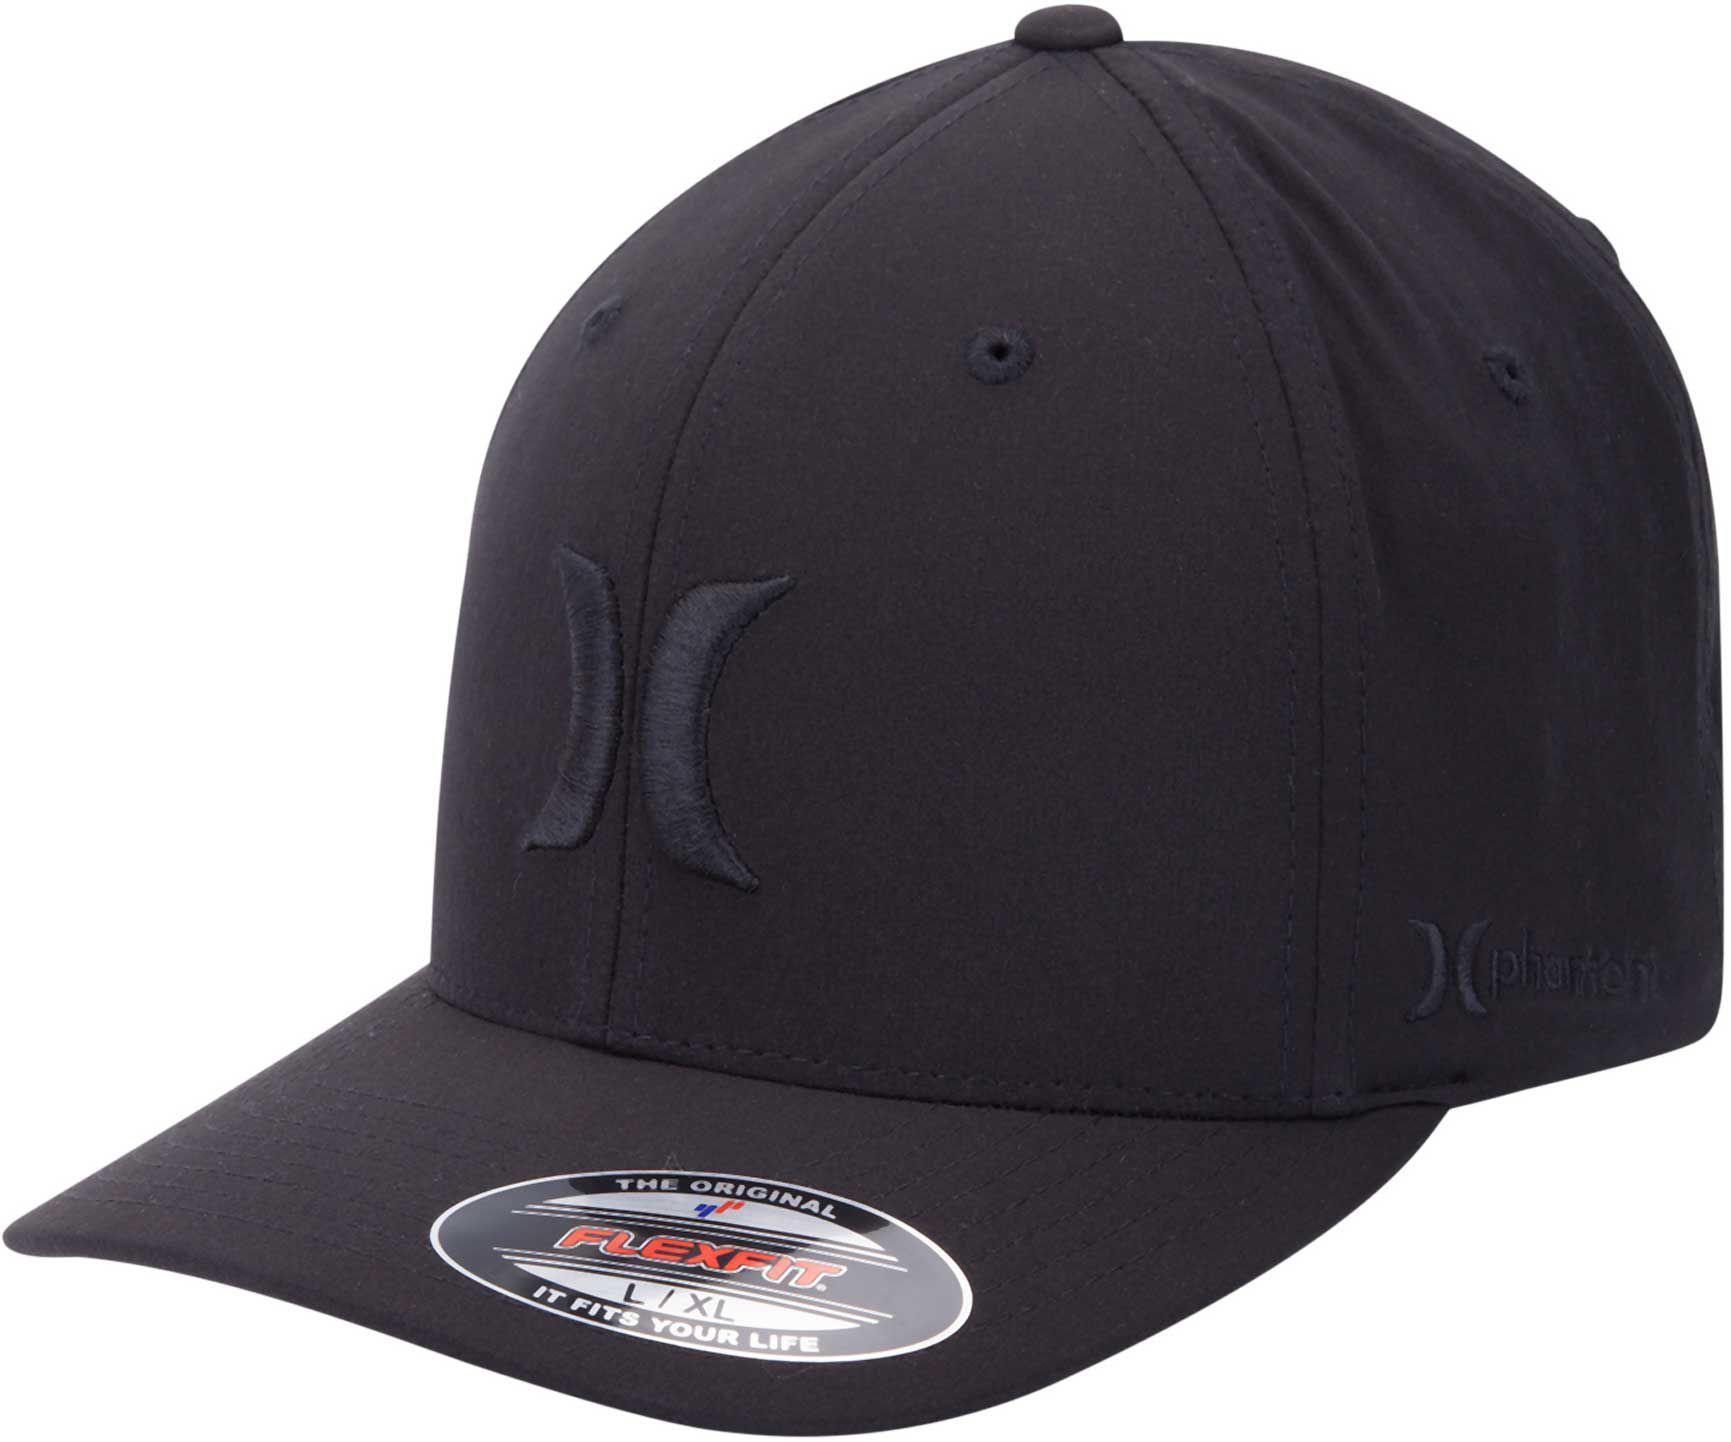 meet 137f8 43ee1 ... low cost lyst hurley phantom boardwalk flexfit hat in black for men  87651 c0aac